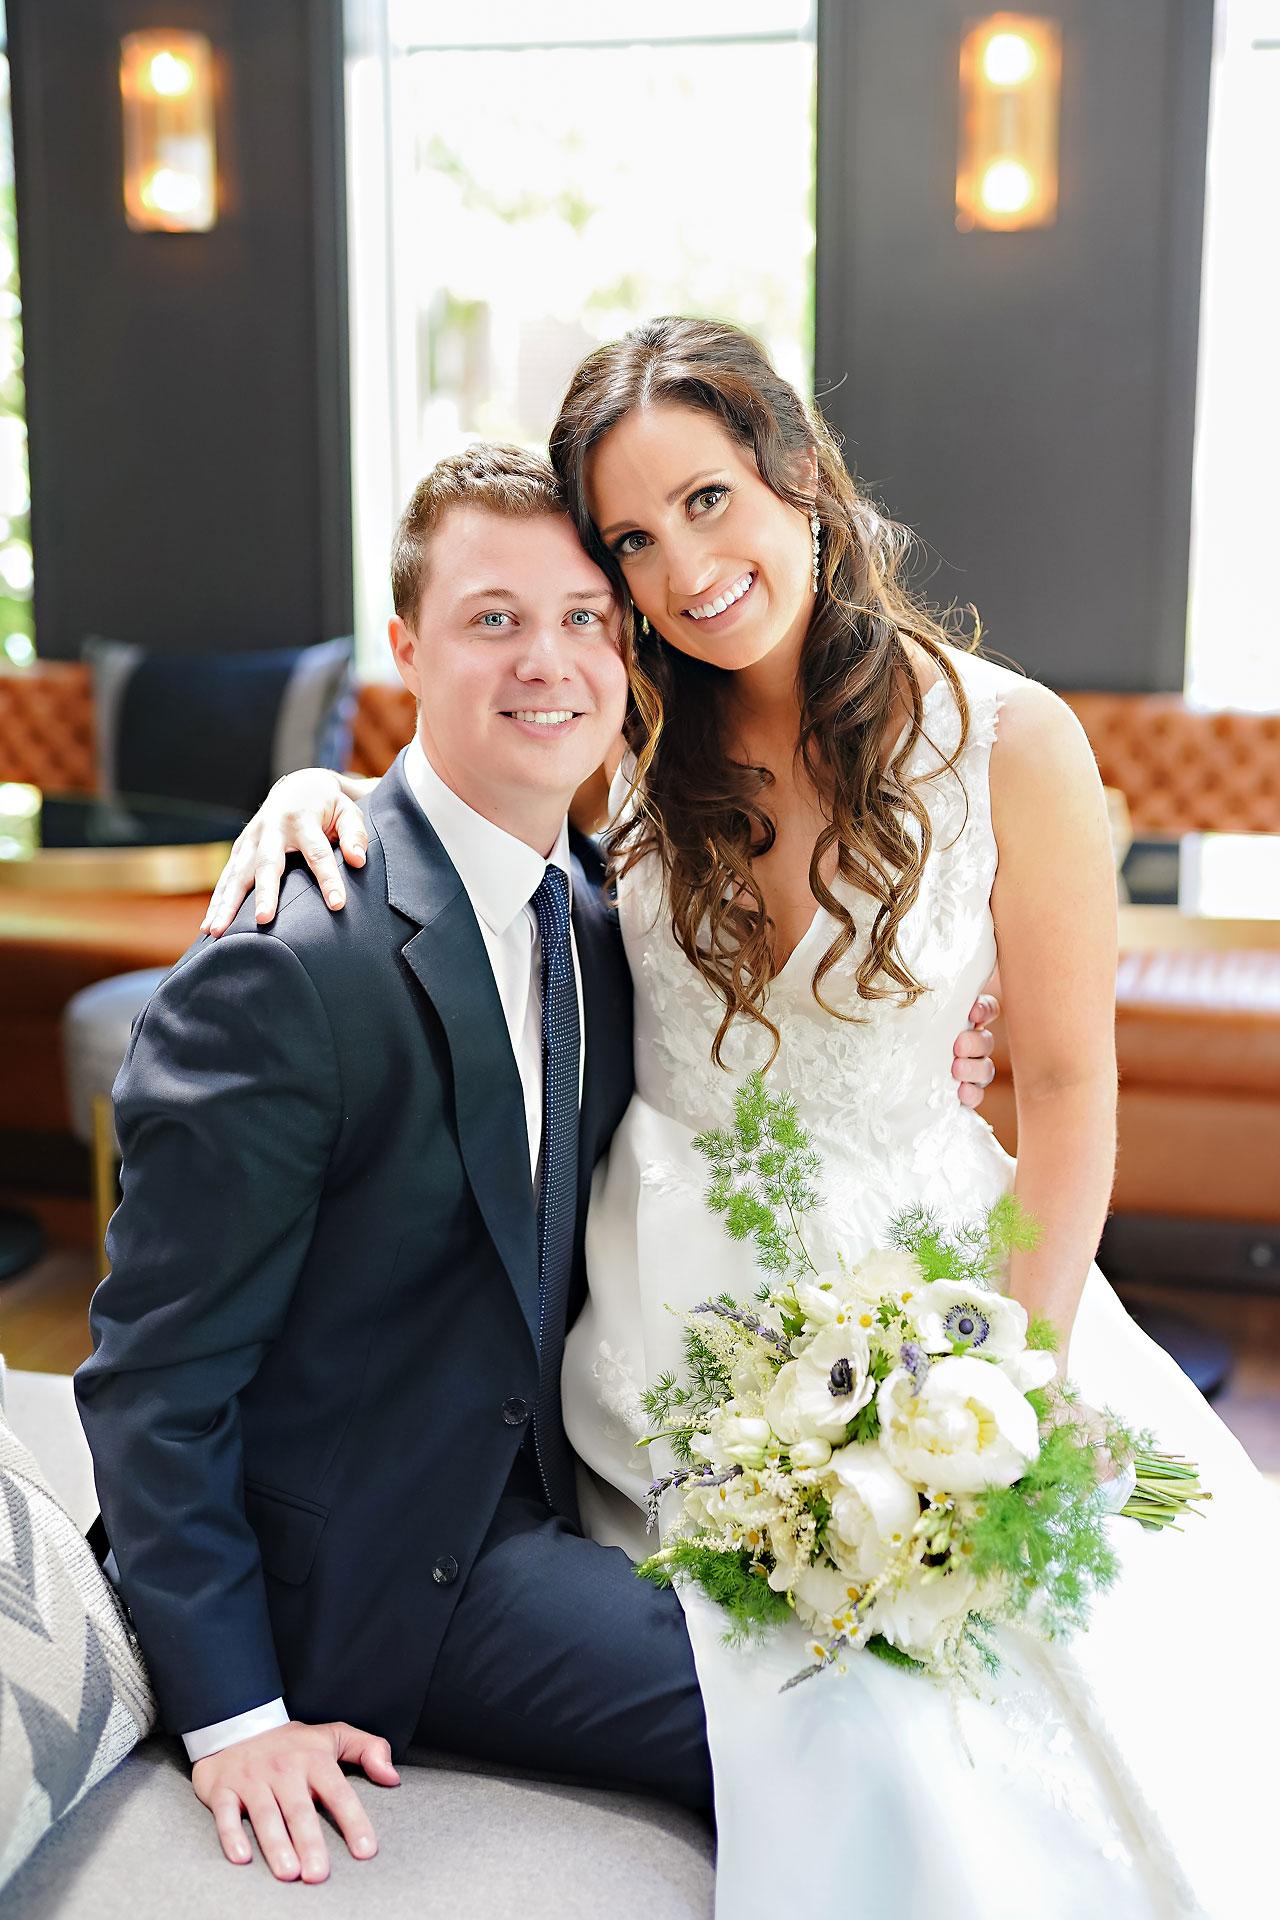 MacKinze John Lafayette Indiana Purdue Wedding 072